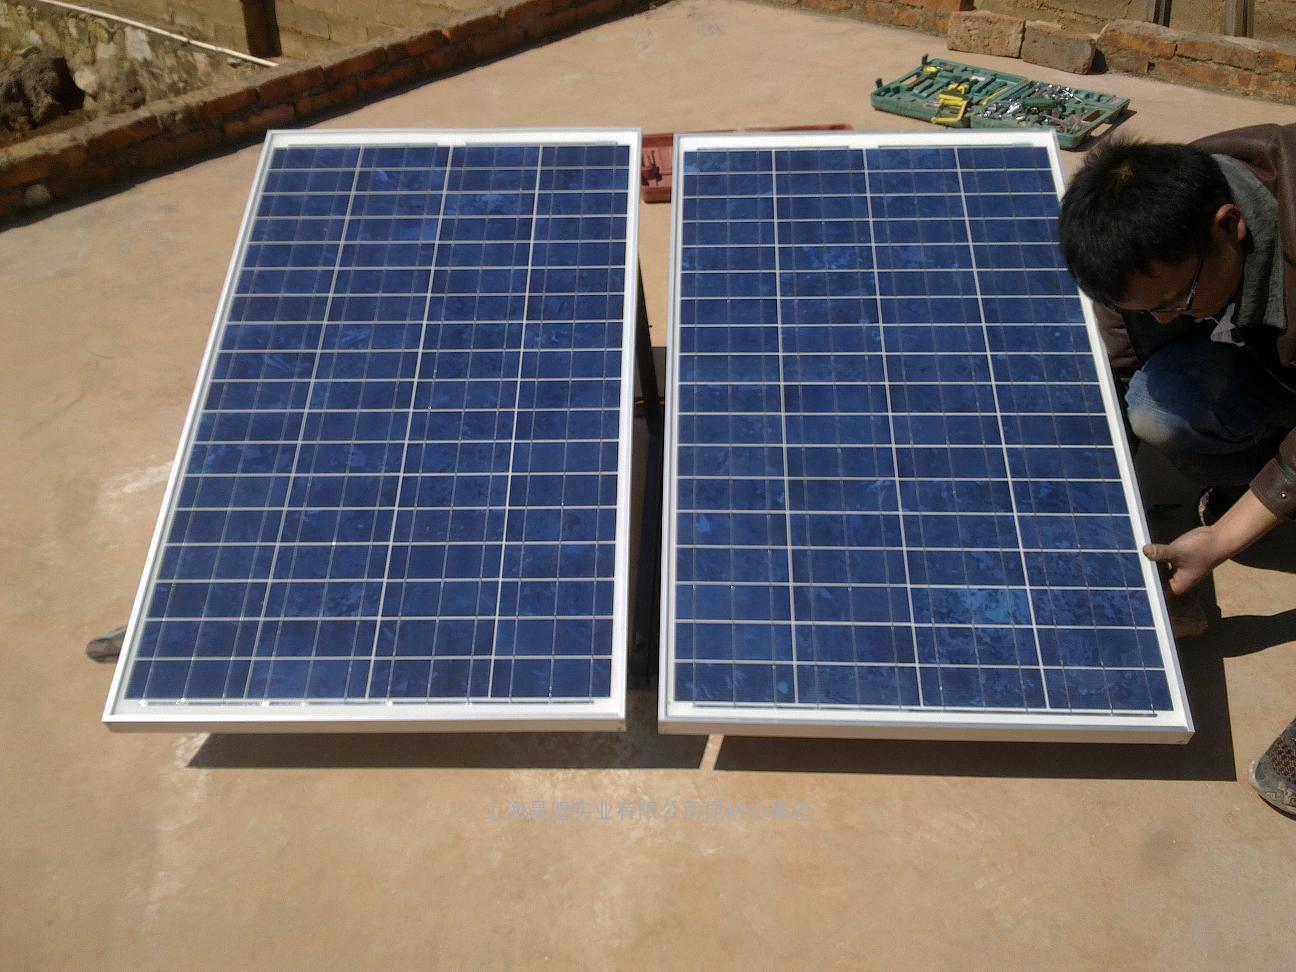 25W Monocrystalline Silicon Sunpower Solar Panel Suit for Solar Street Light